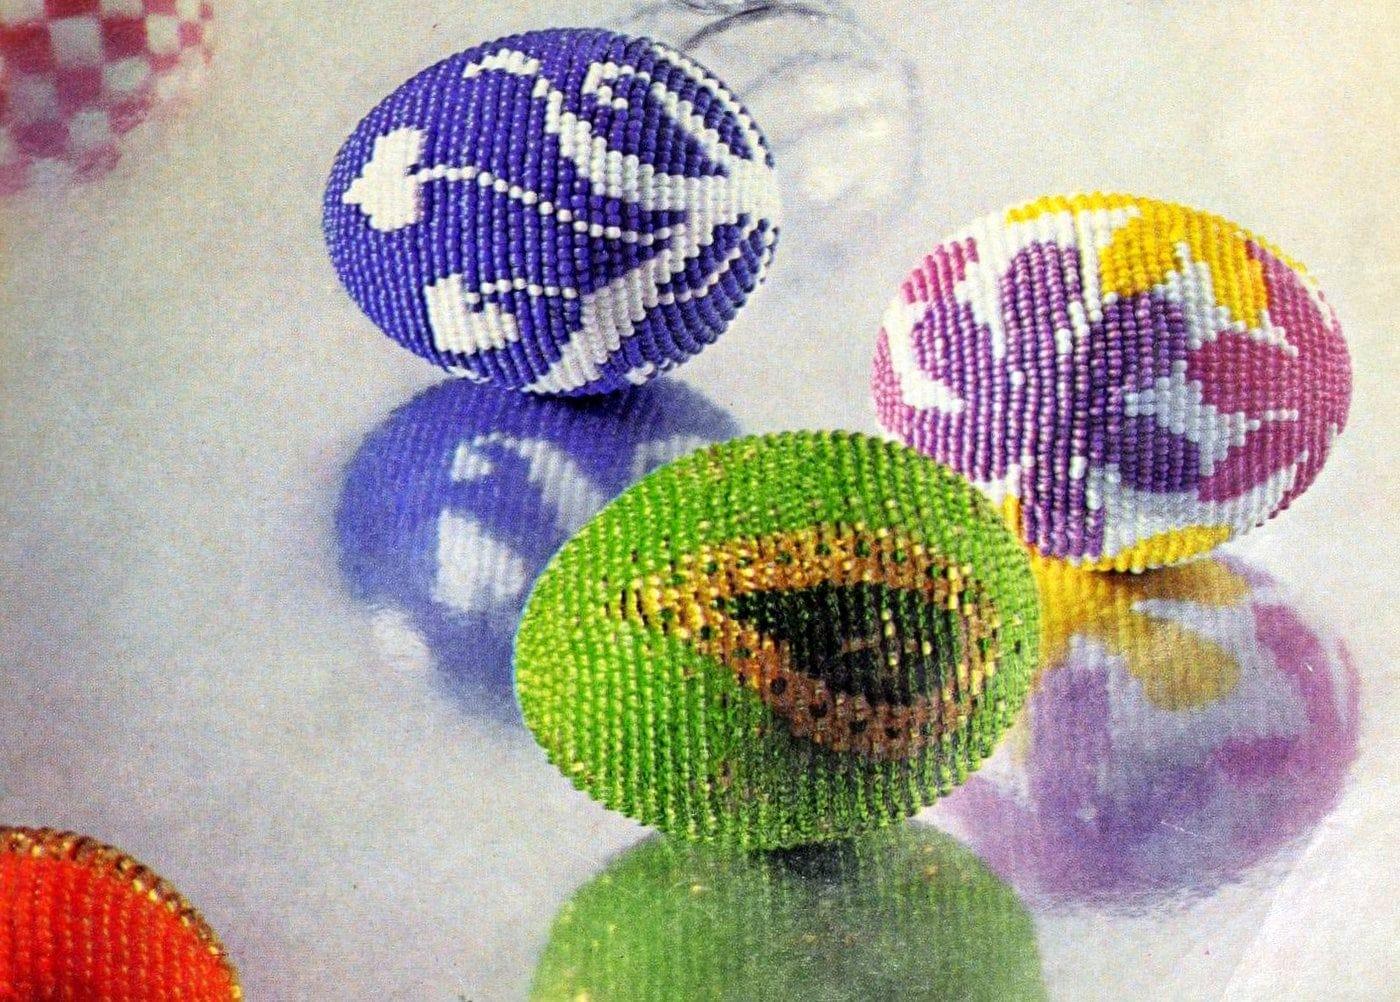 Vintage egg crafts - beaded eggs